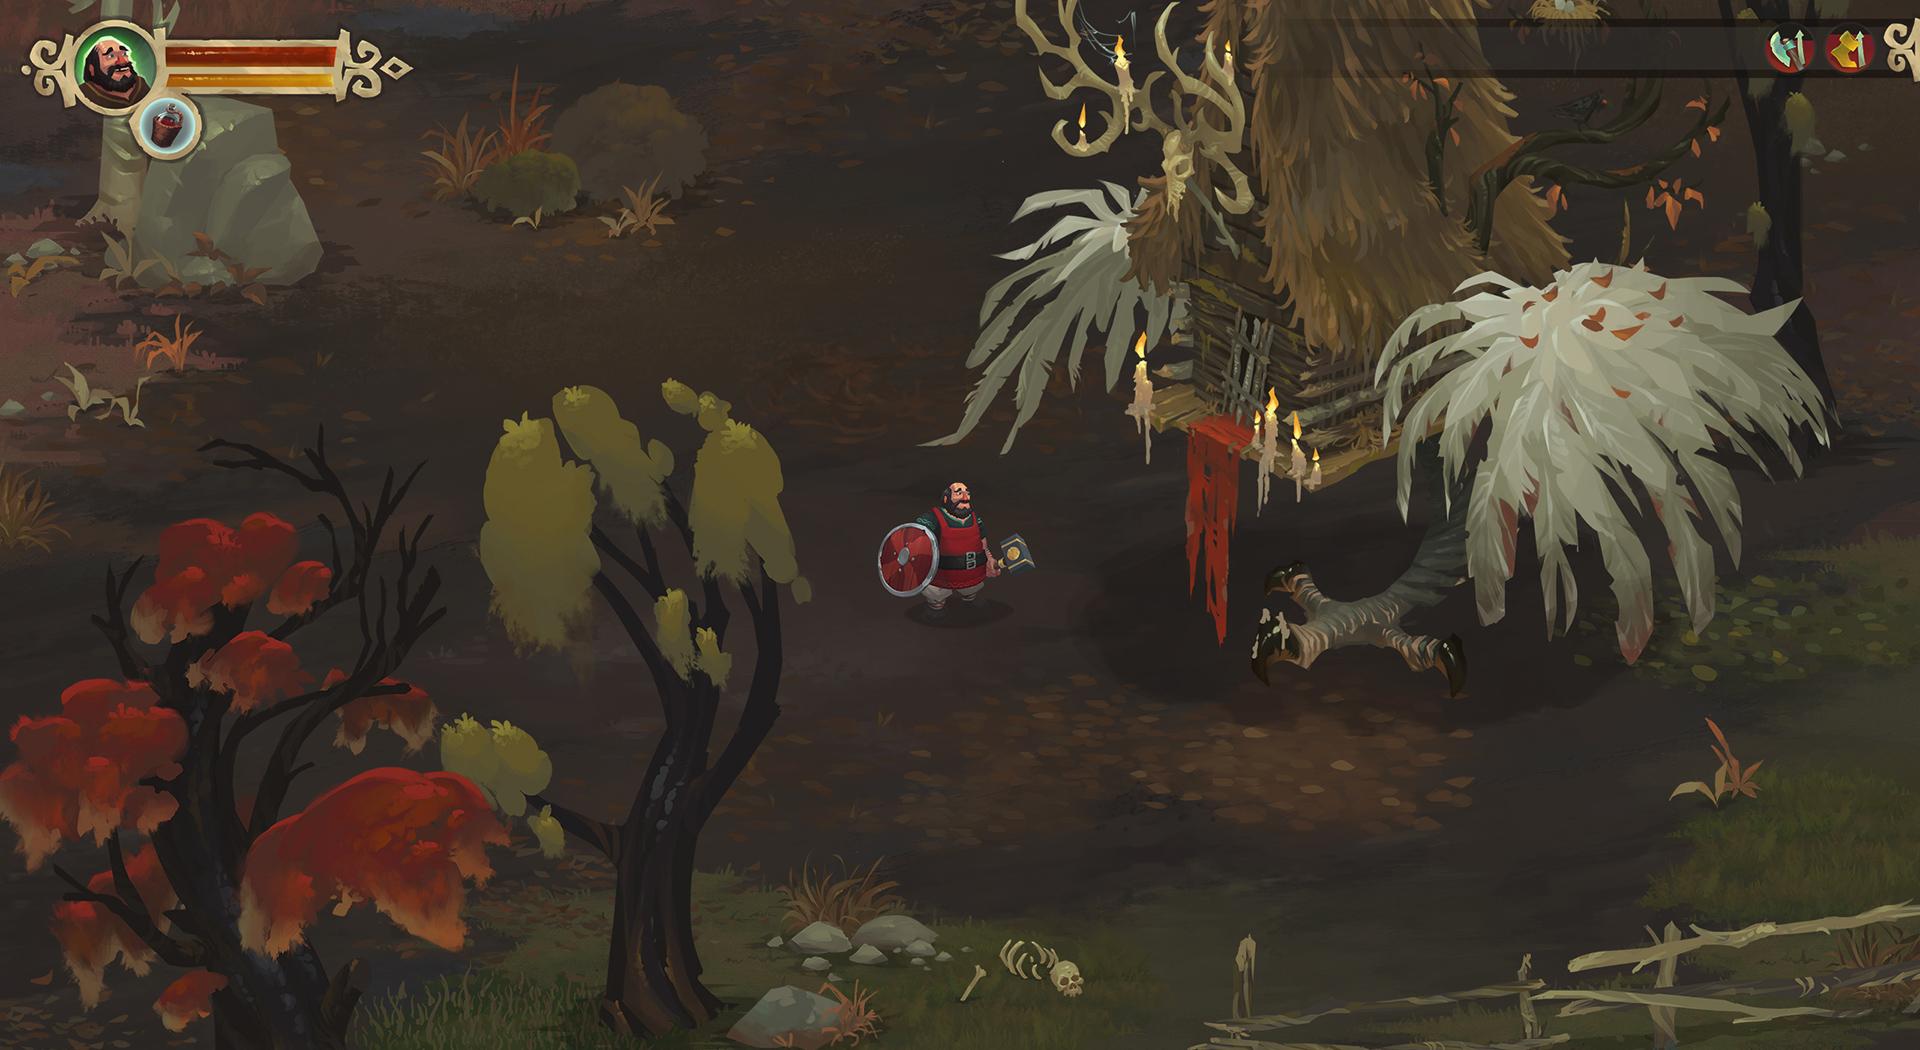 Yaga is a charming action-RPG take on Slavic folklore screenshot